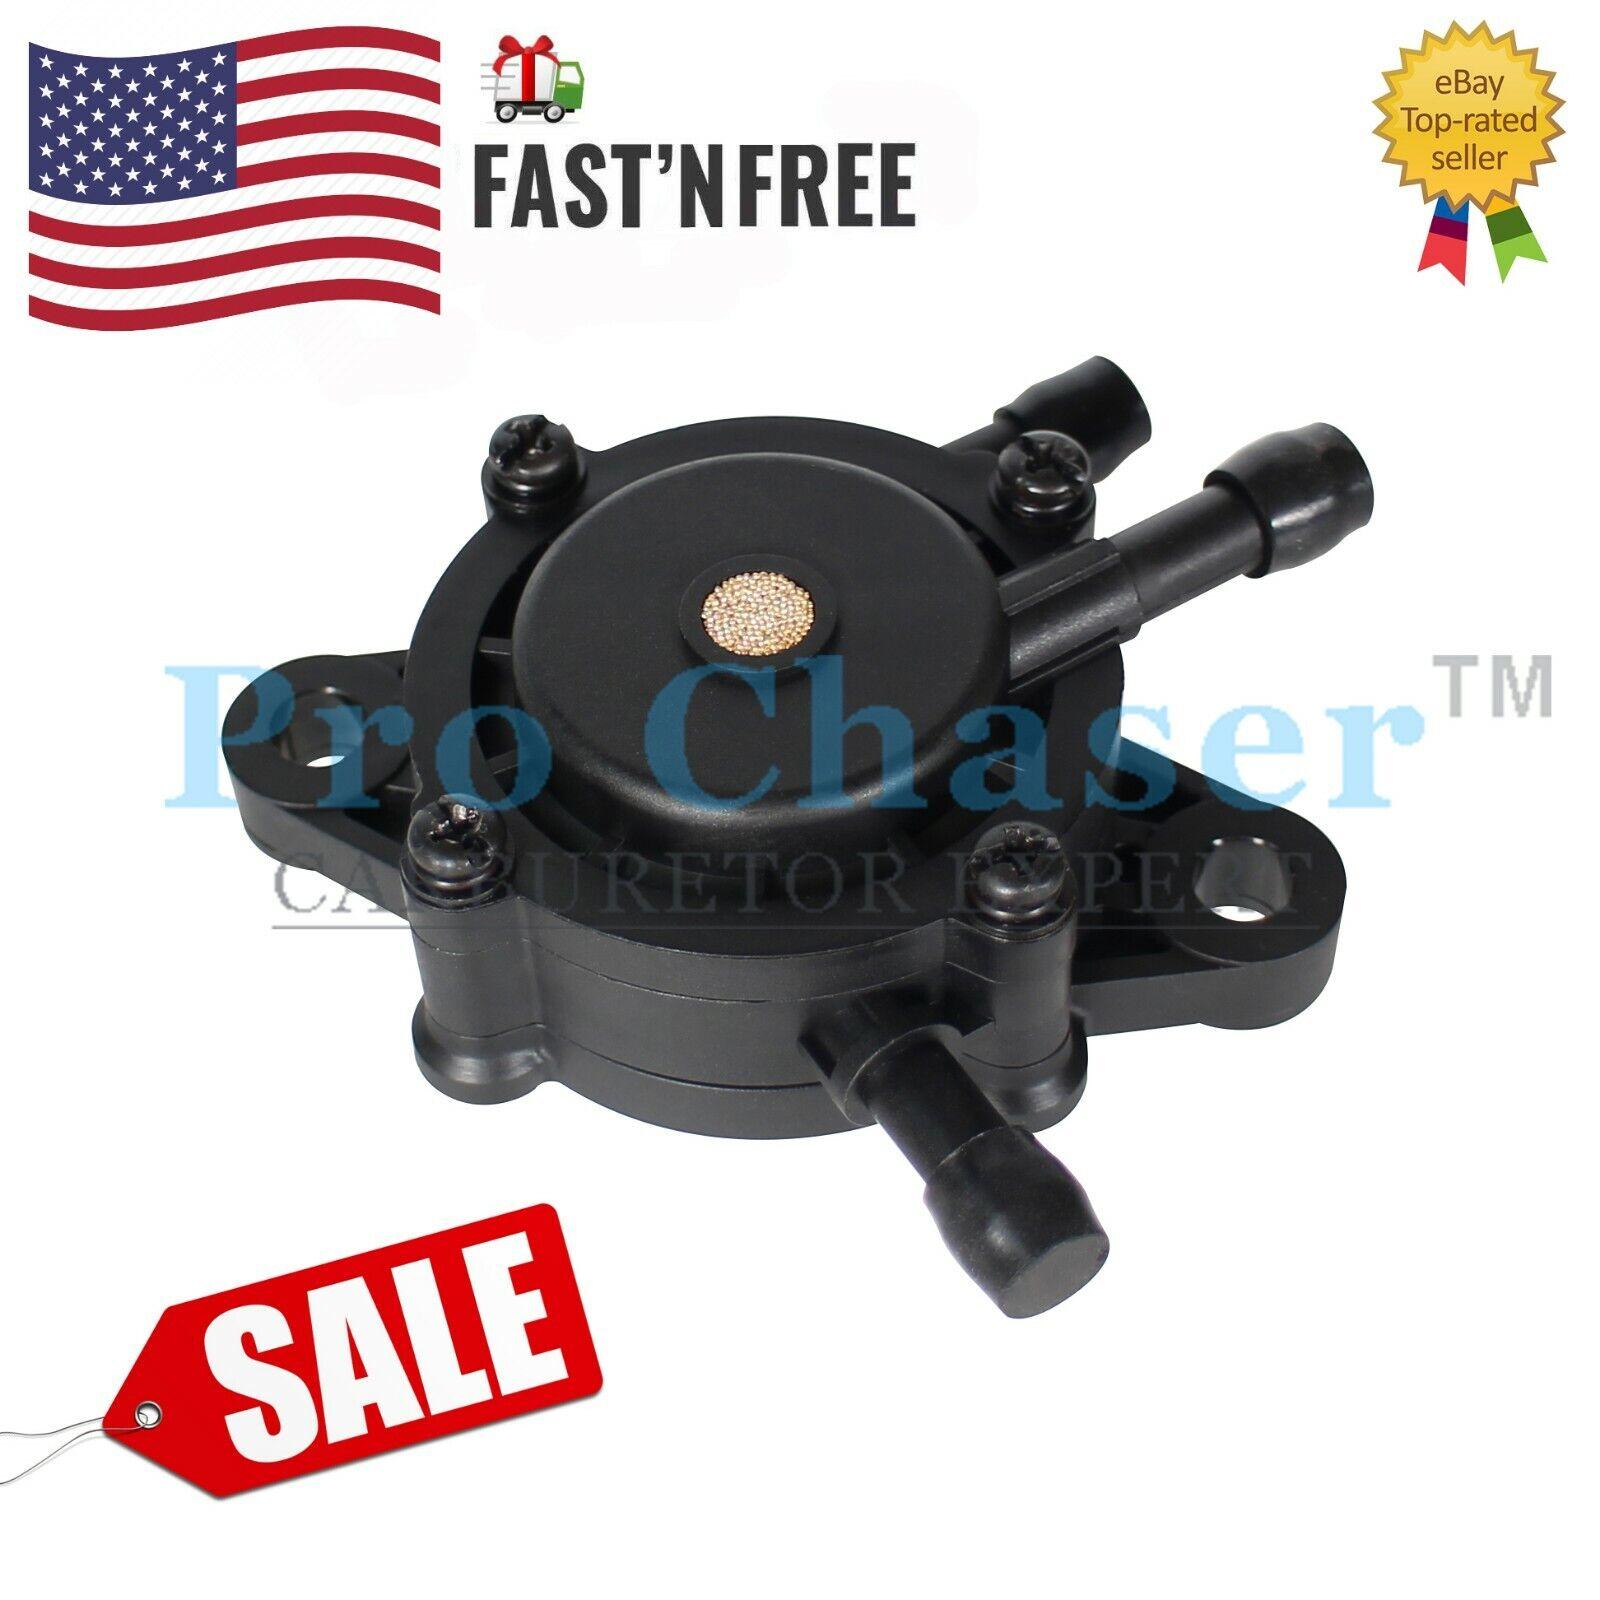 Fuel pump for Briggs /& Stratton 311707 311777 312707 312777 313707 313777 engine